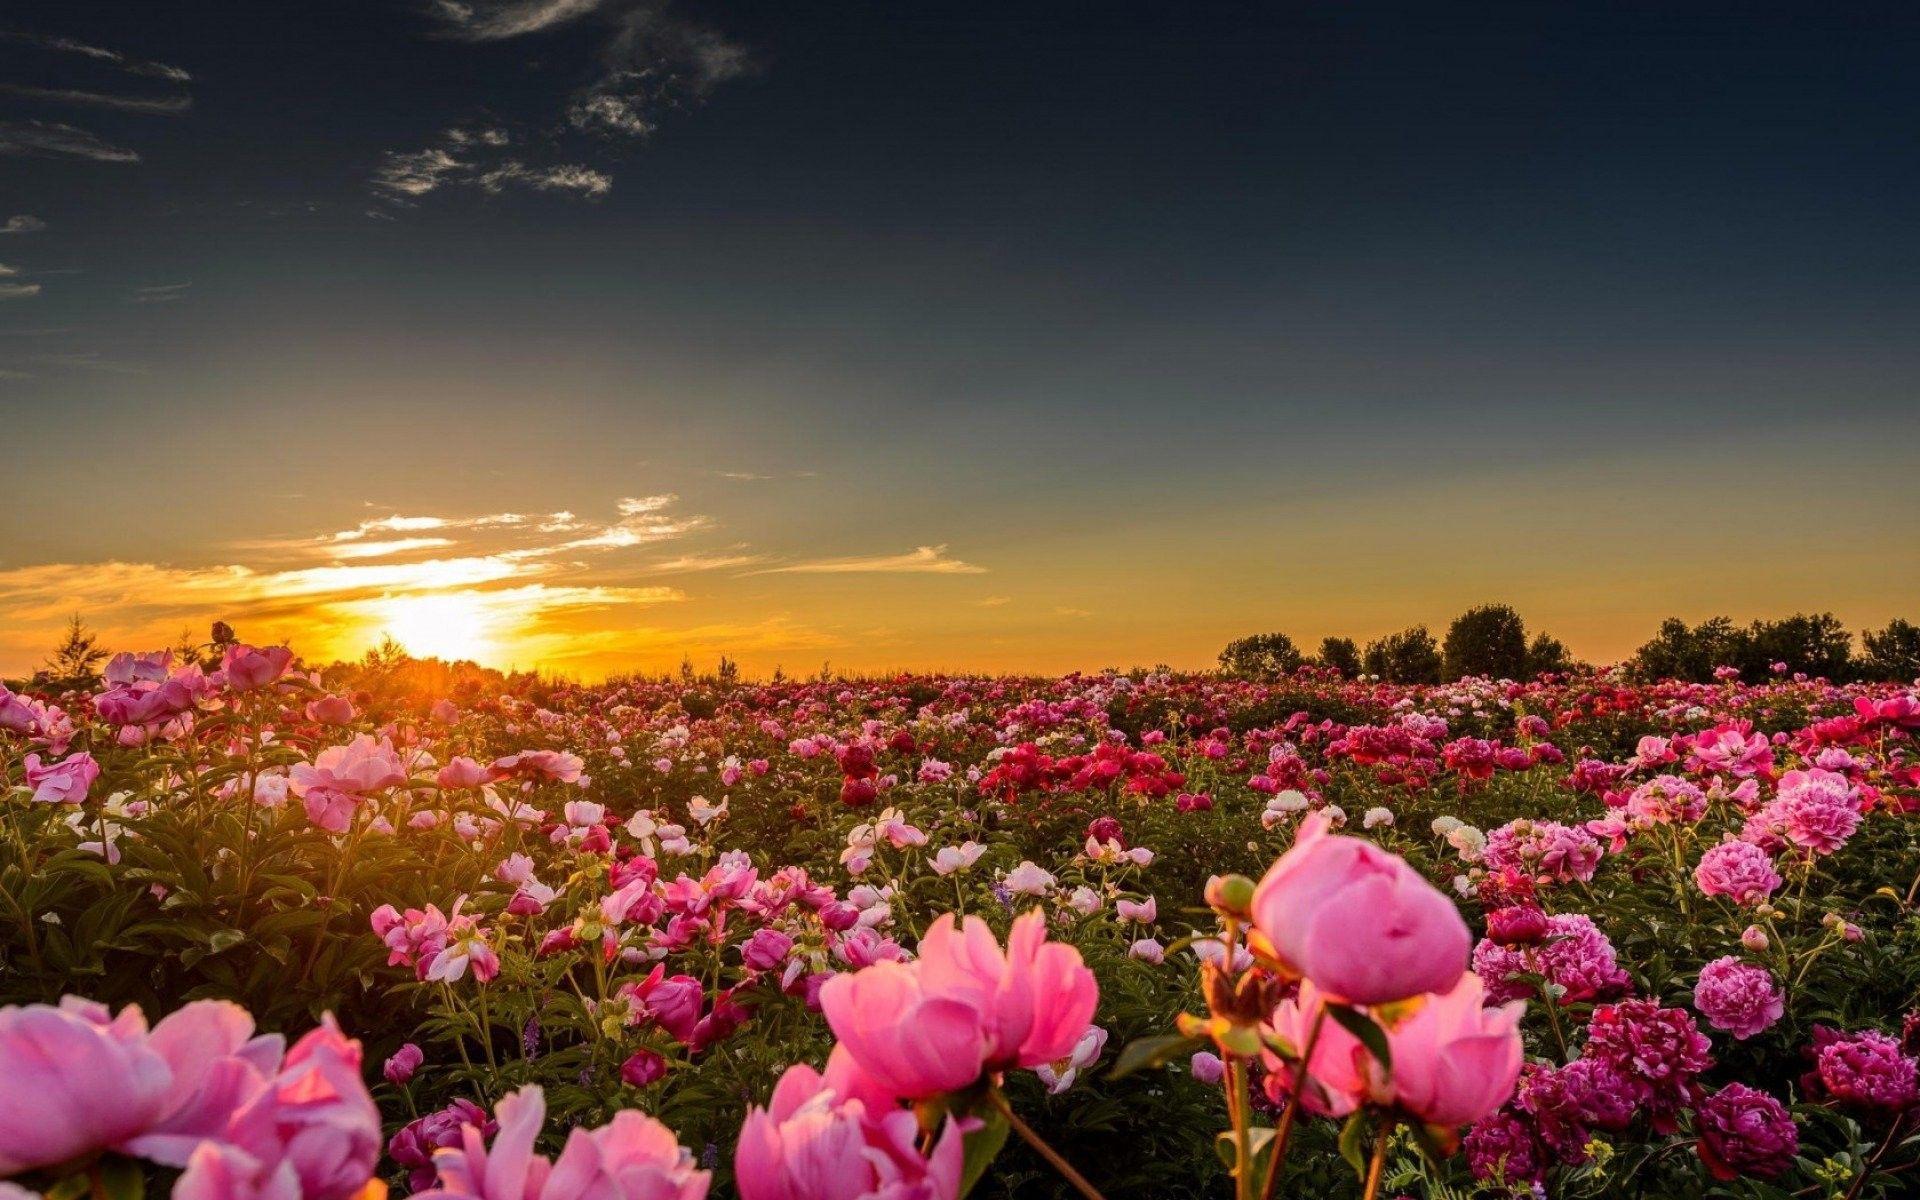 Sunset Peonies Pink Flower Pc Wallpaper Hd Nature Download - Flower Nature Wallpaper Hd For Pc - HD Wallpaper